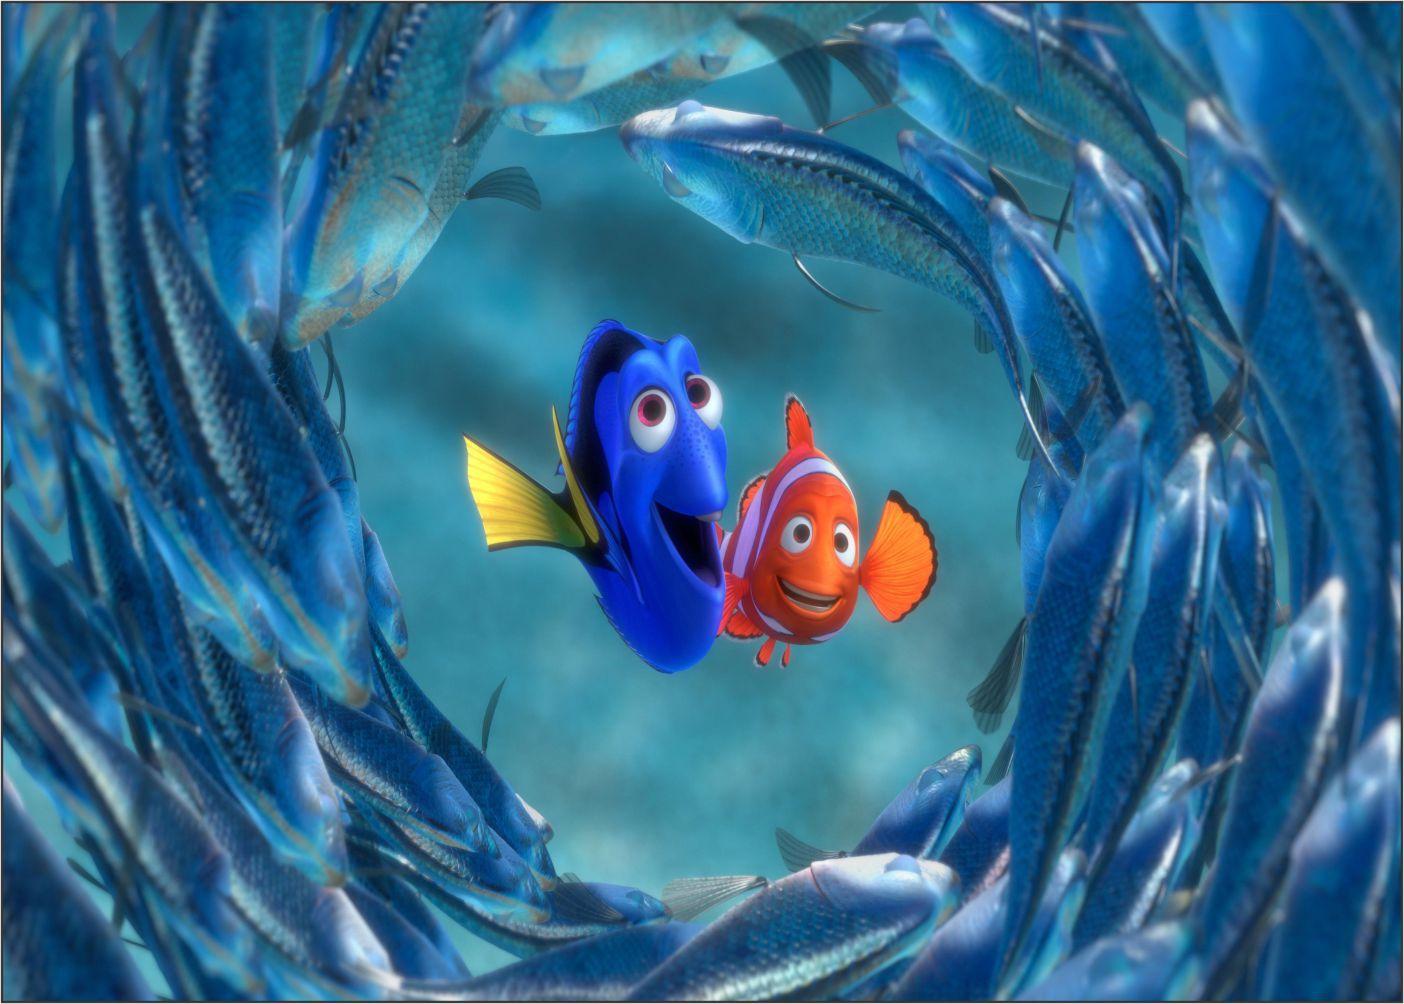 Papel de Parede 3D Nemo 0007 - Adesivos de Parede  - Paredes Decoradas